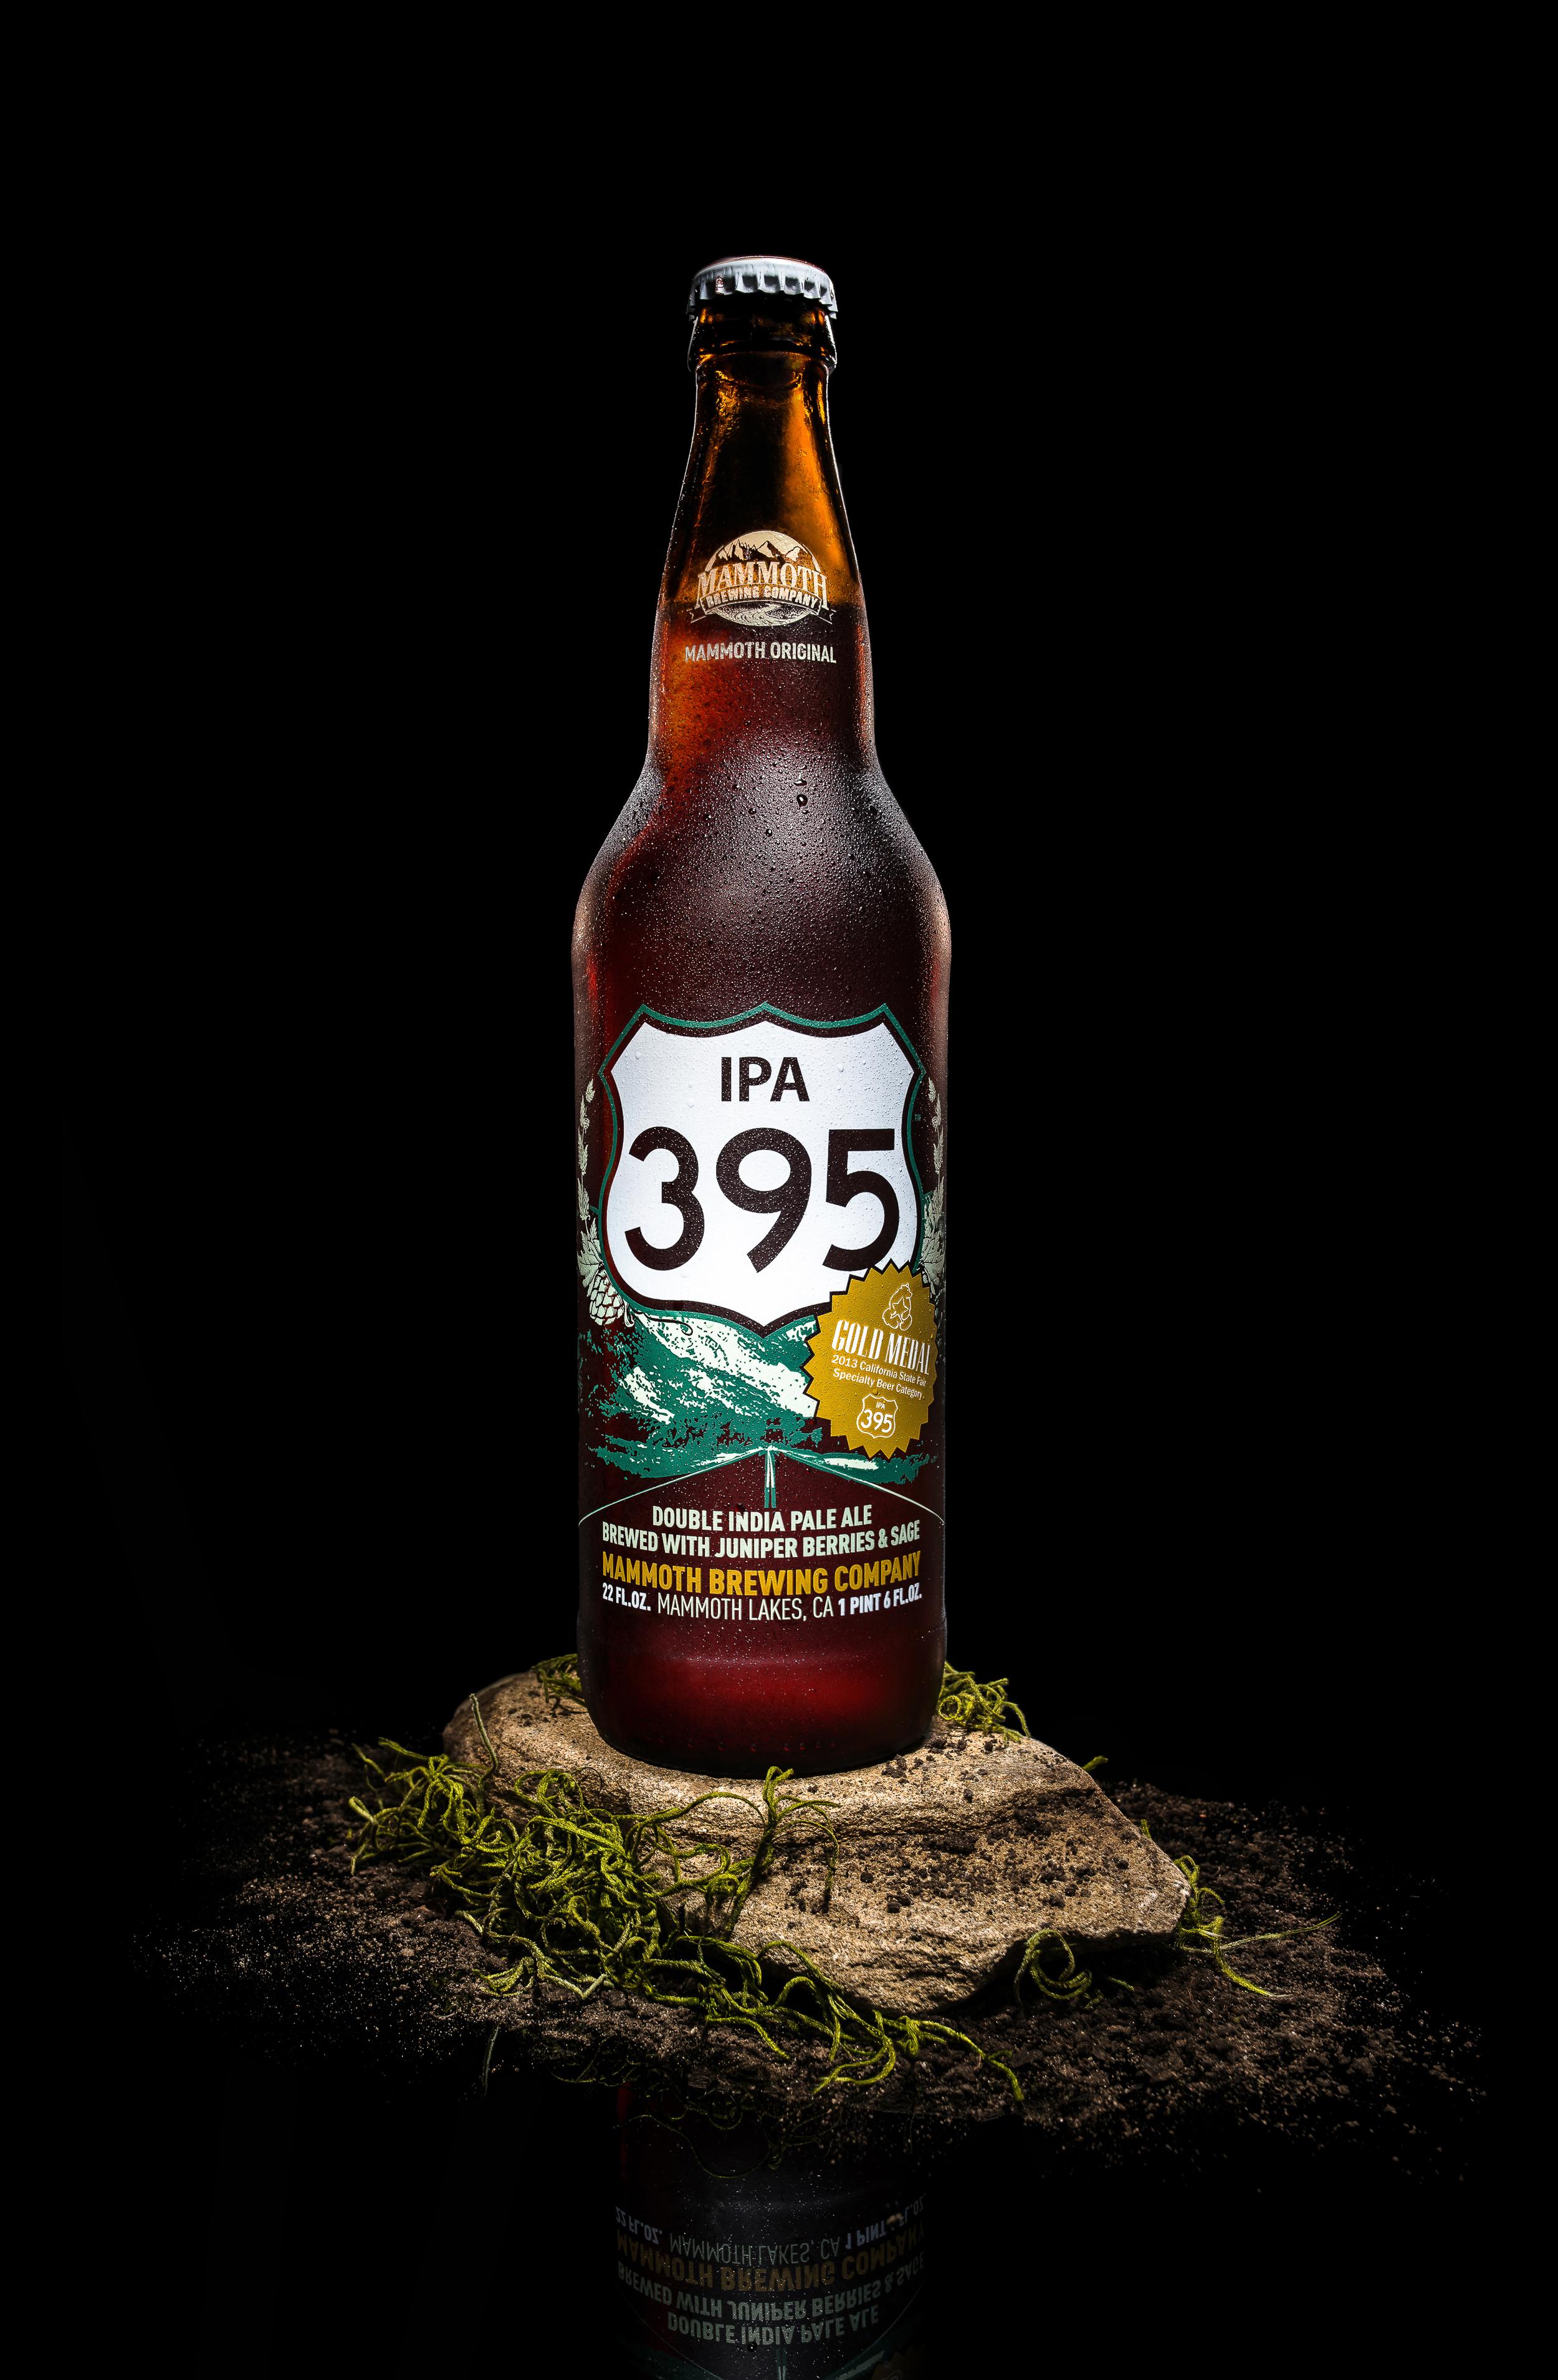 Mammoth-Brewery-IPA-395-Final.jpg